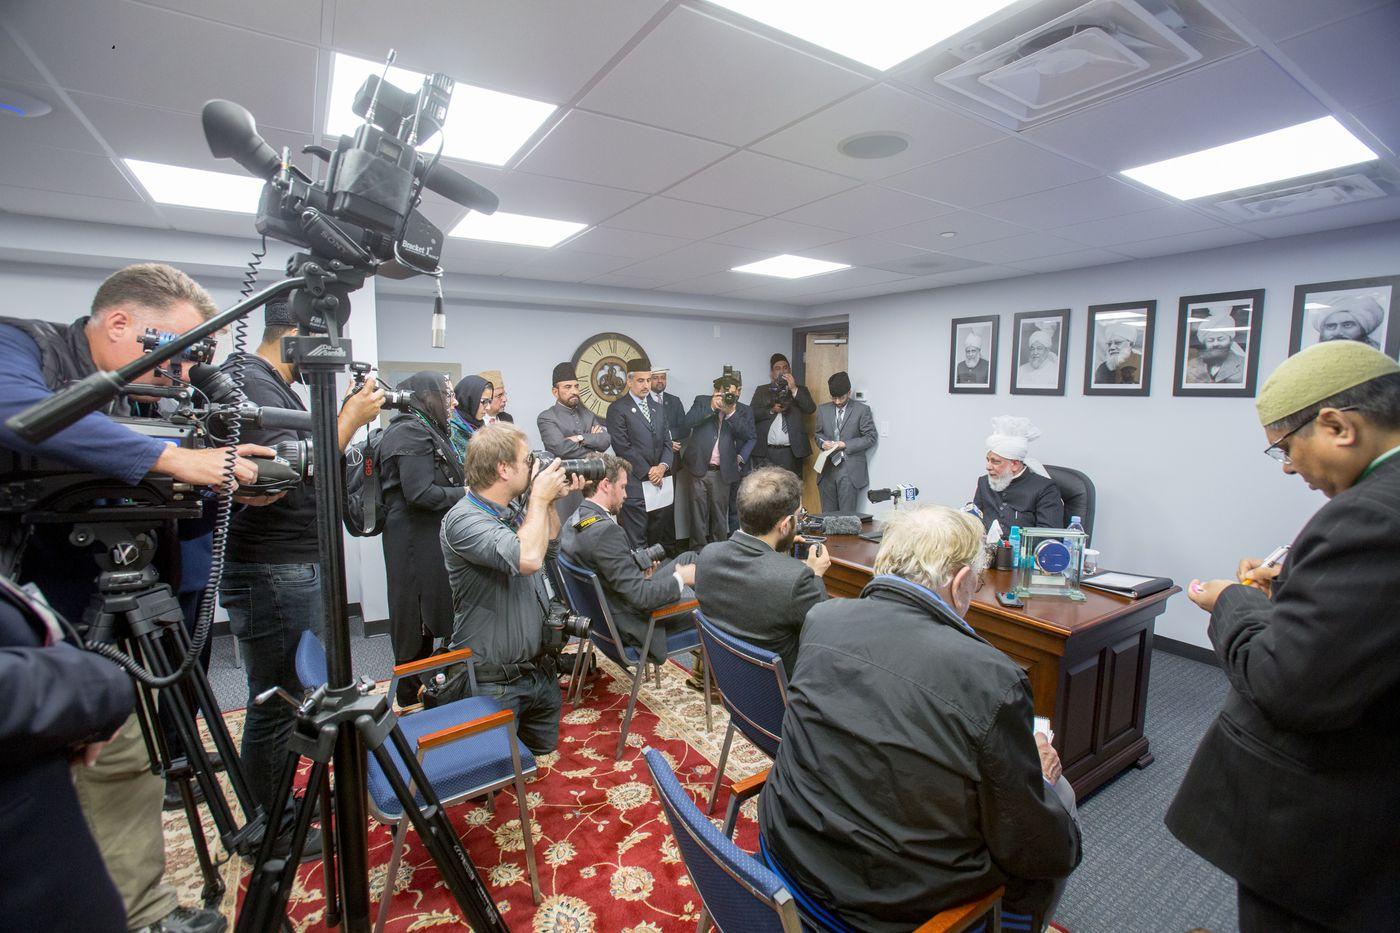 Mirza Masroor Ahmad, world spiritual leader of the Ahmadiyya Muslim Community, meets the Philly media.